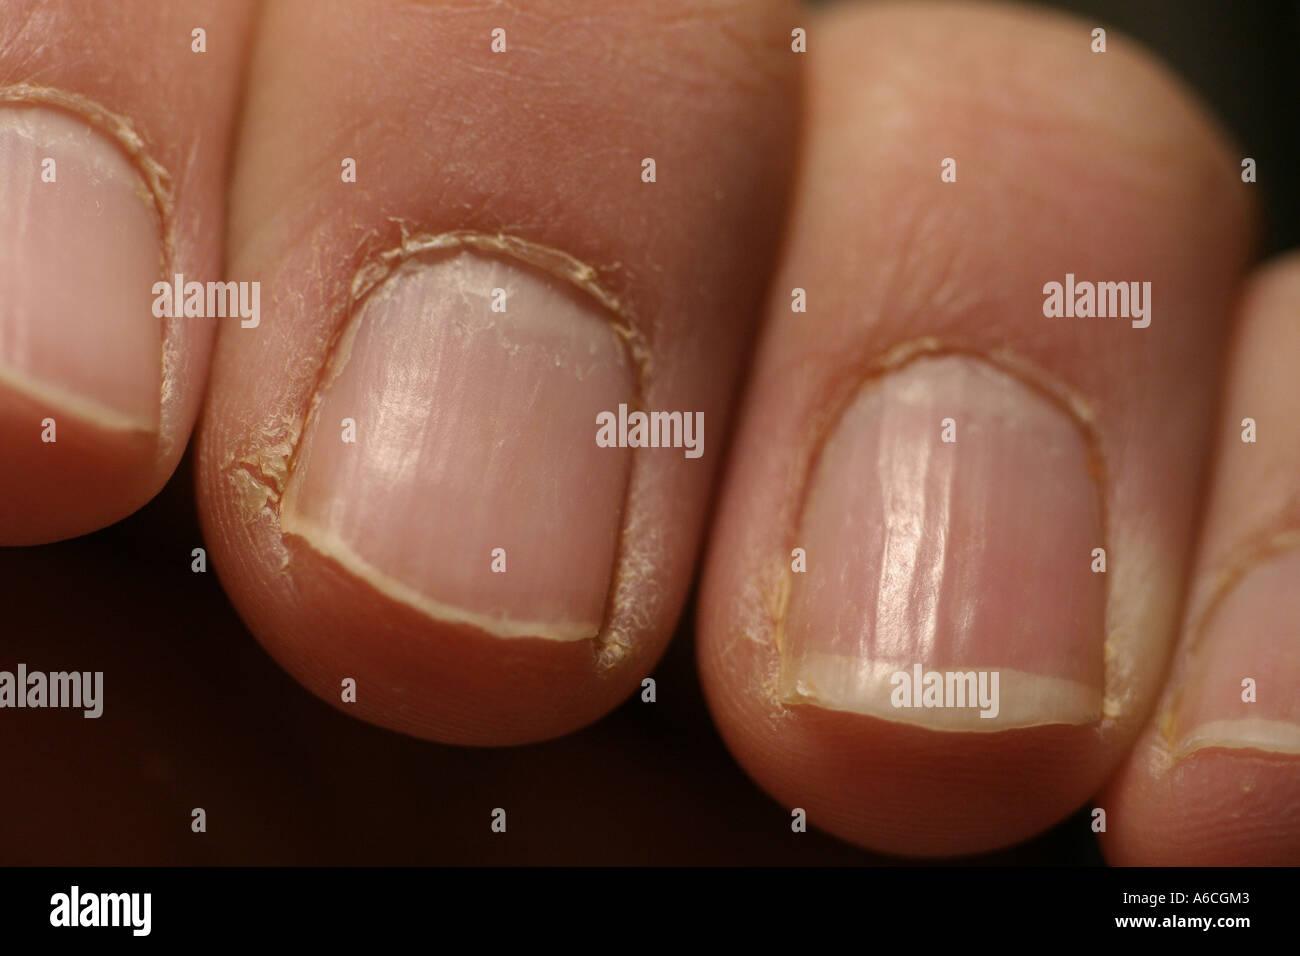 Dry Cracked Fingers Stock Photo: 6590530 - Alamy